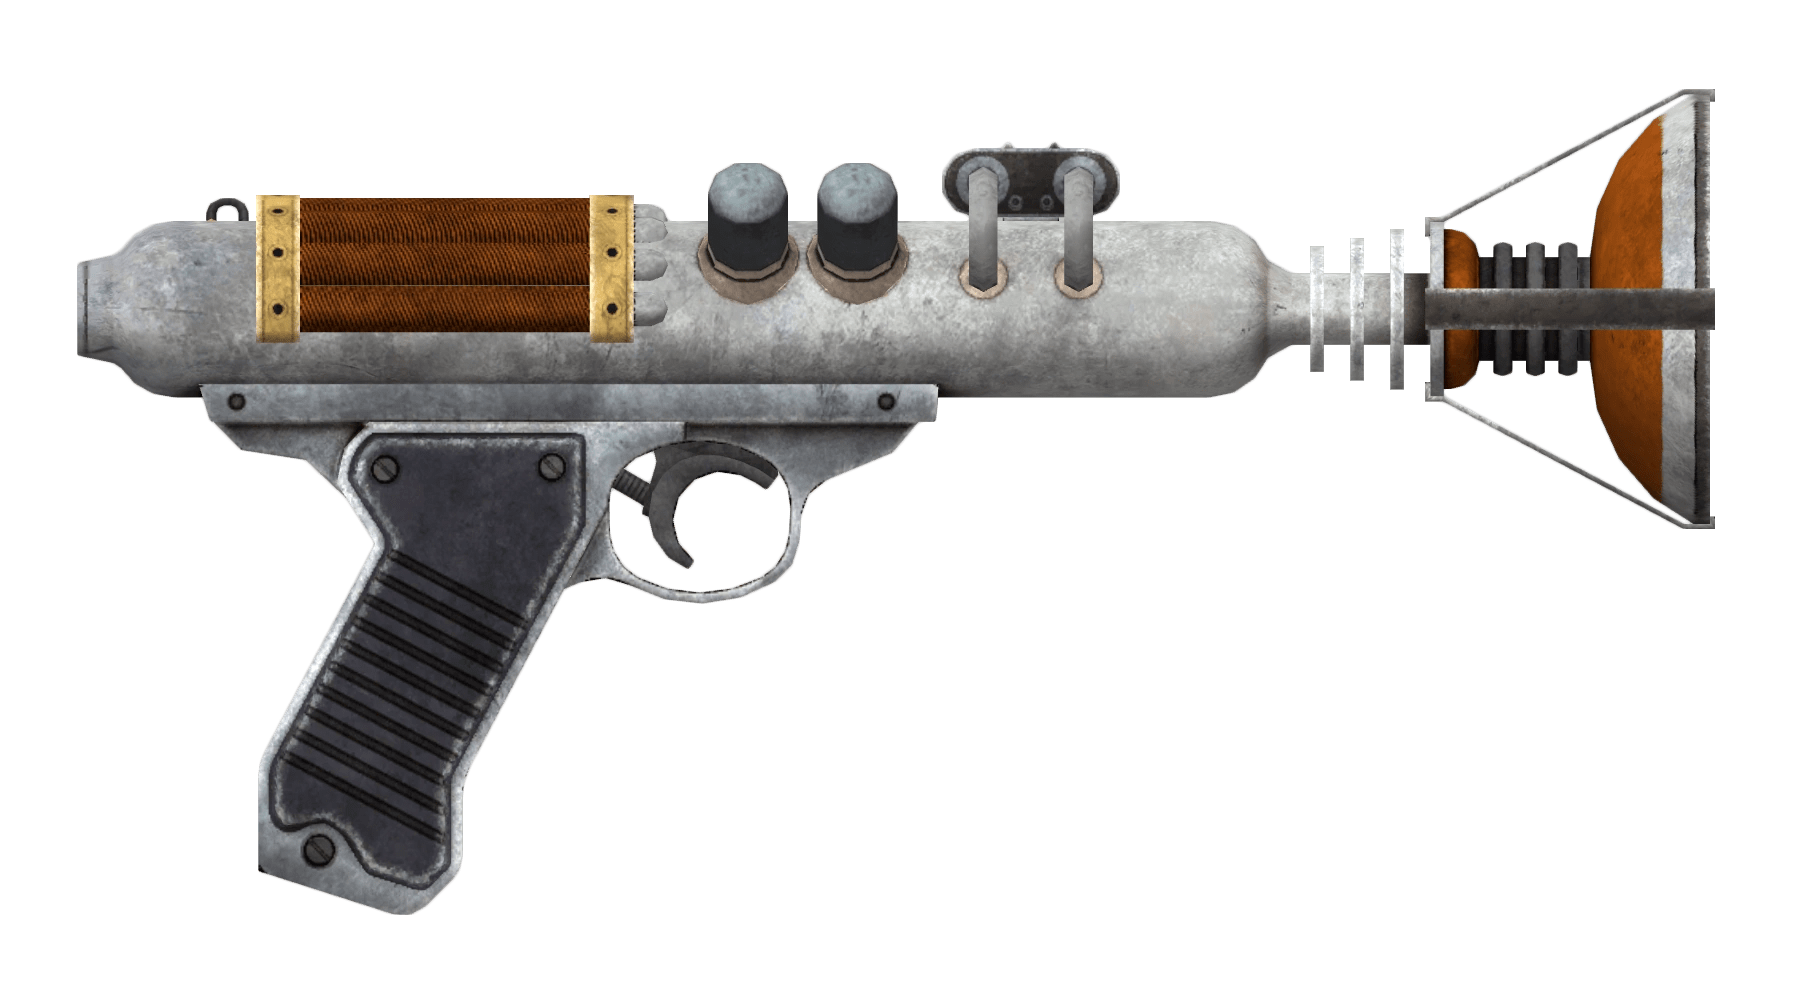 Pulse Gun Fallout New Vegas